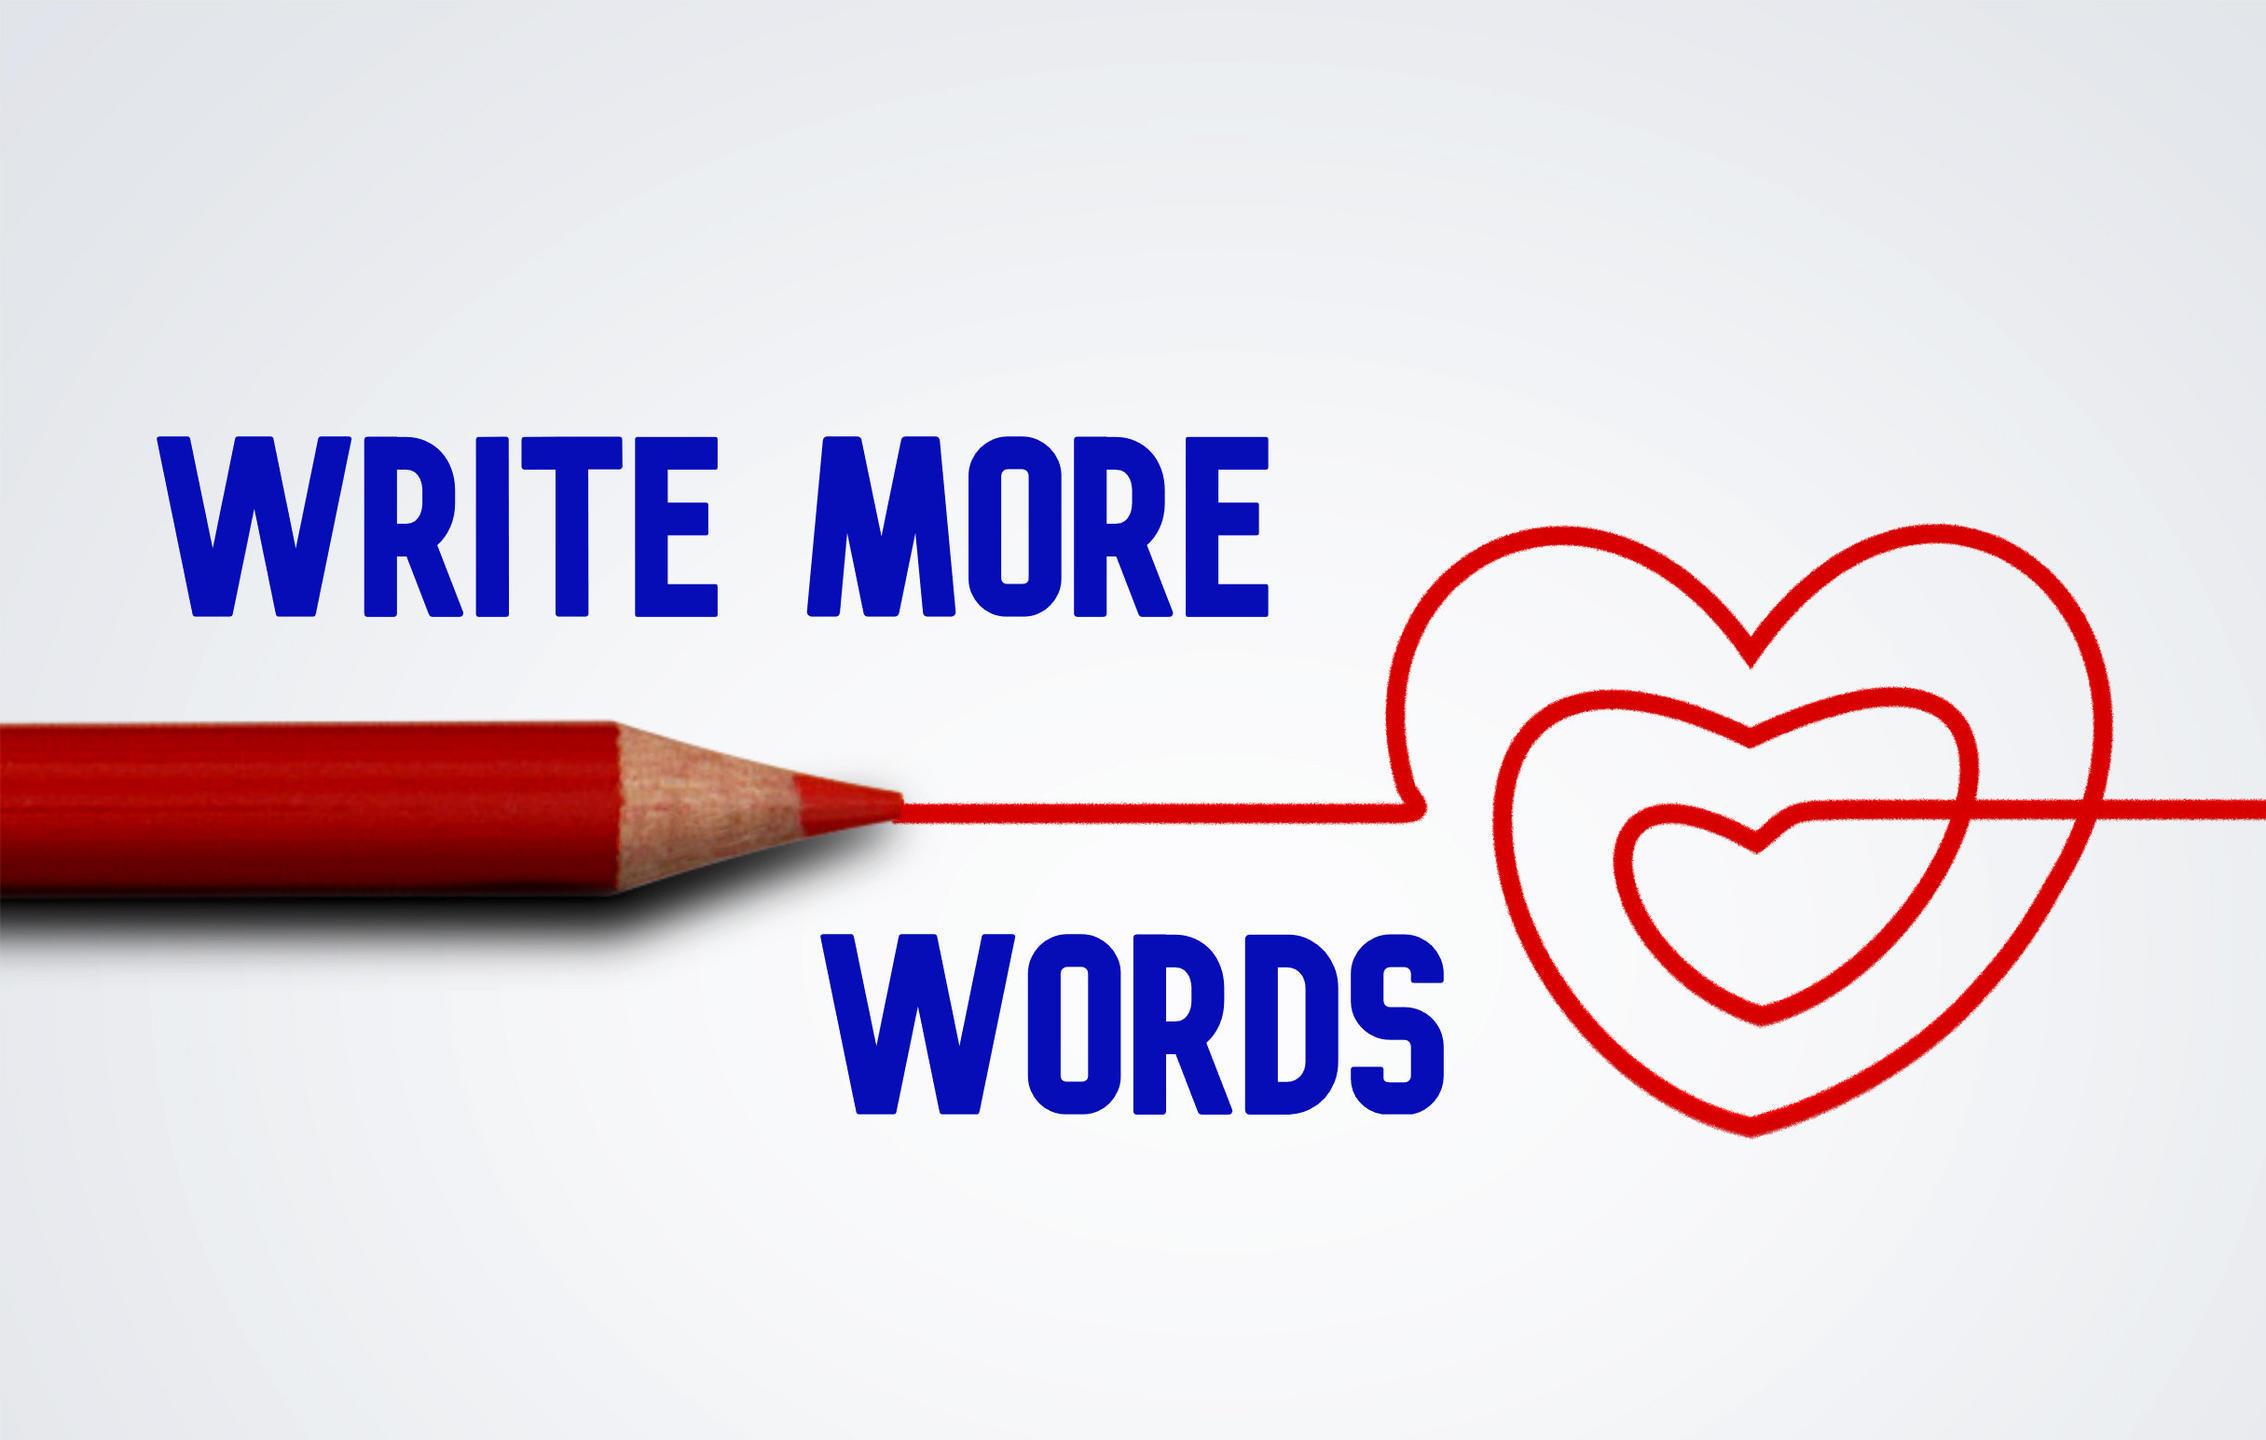 Write More Words heart logo